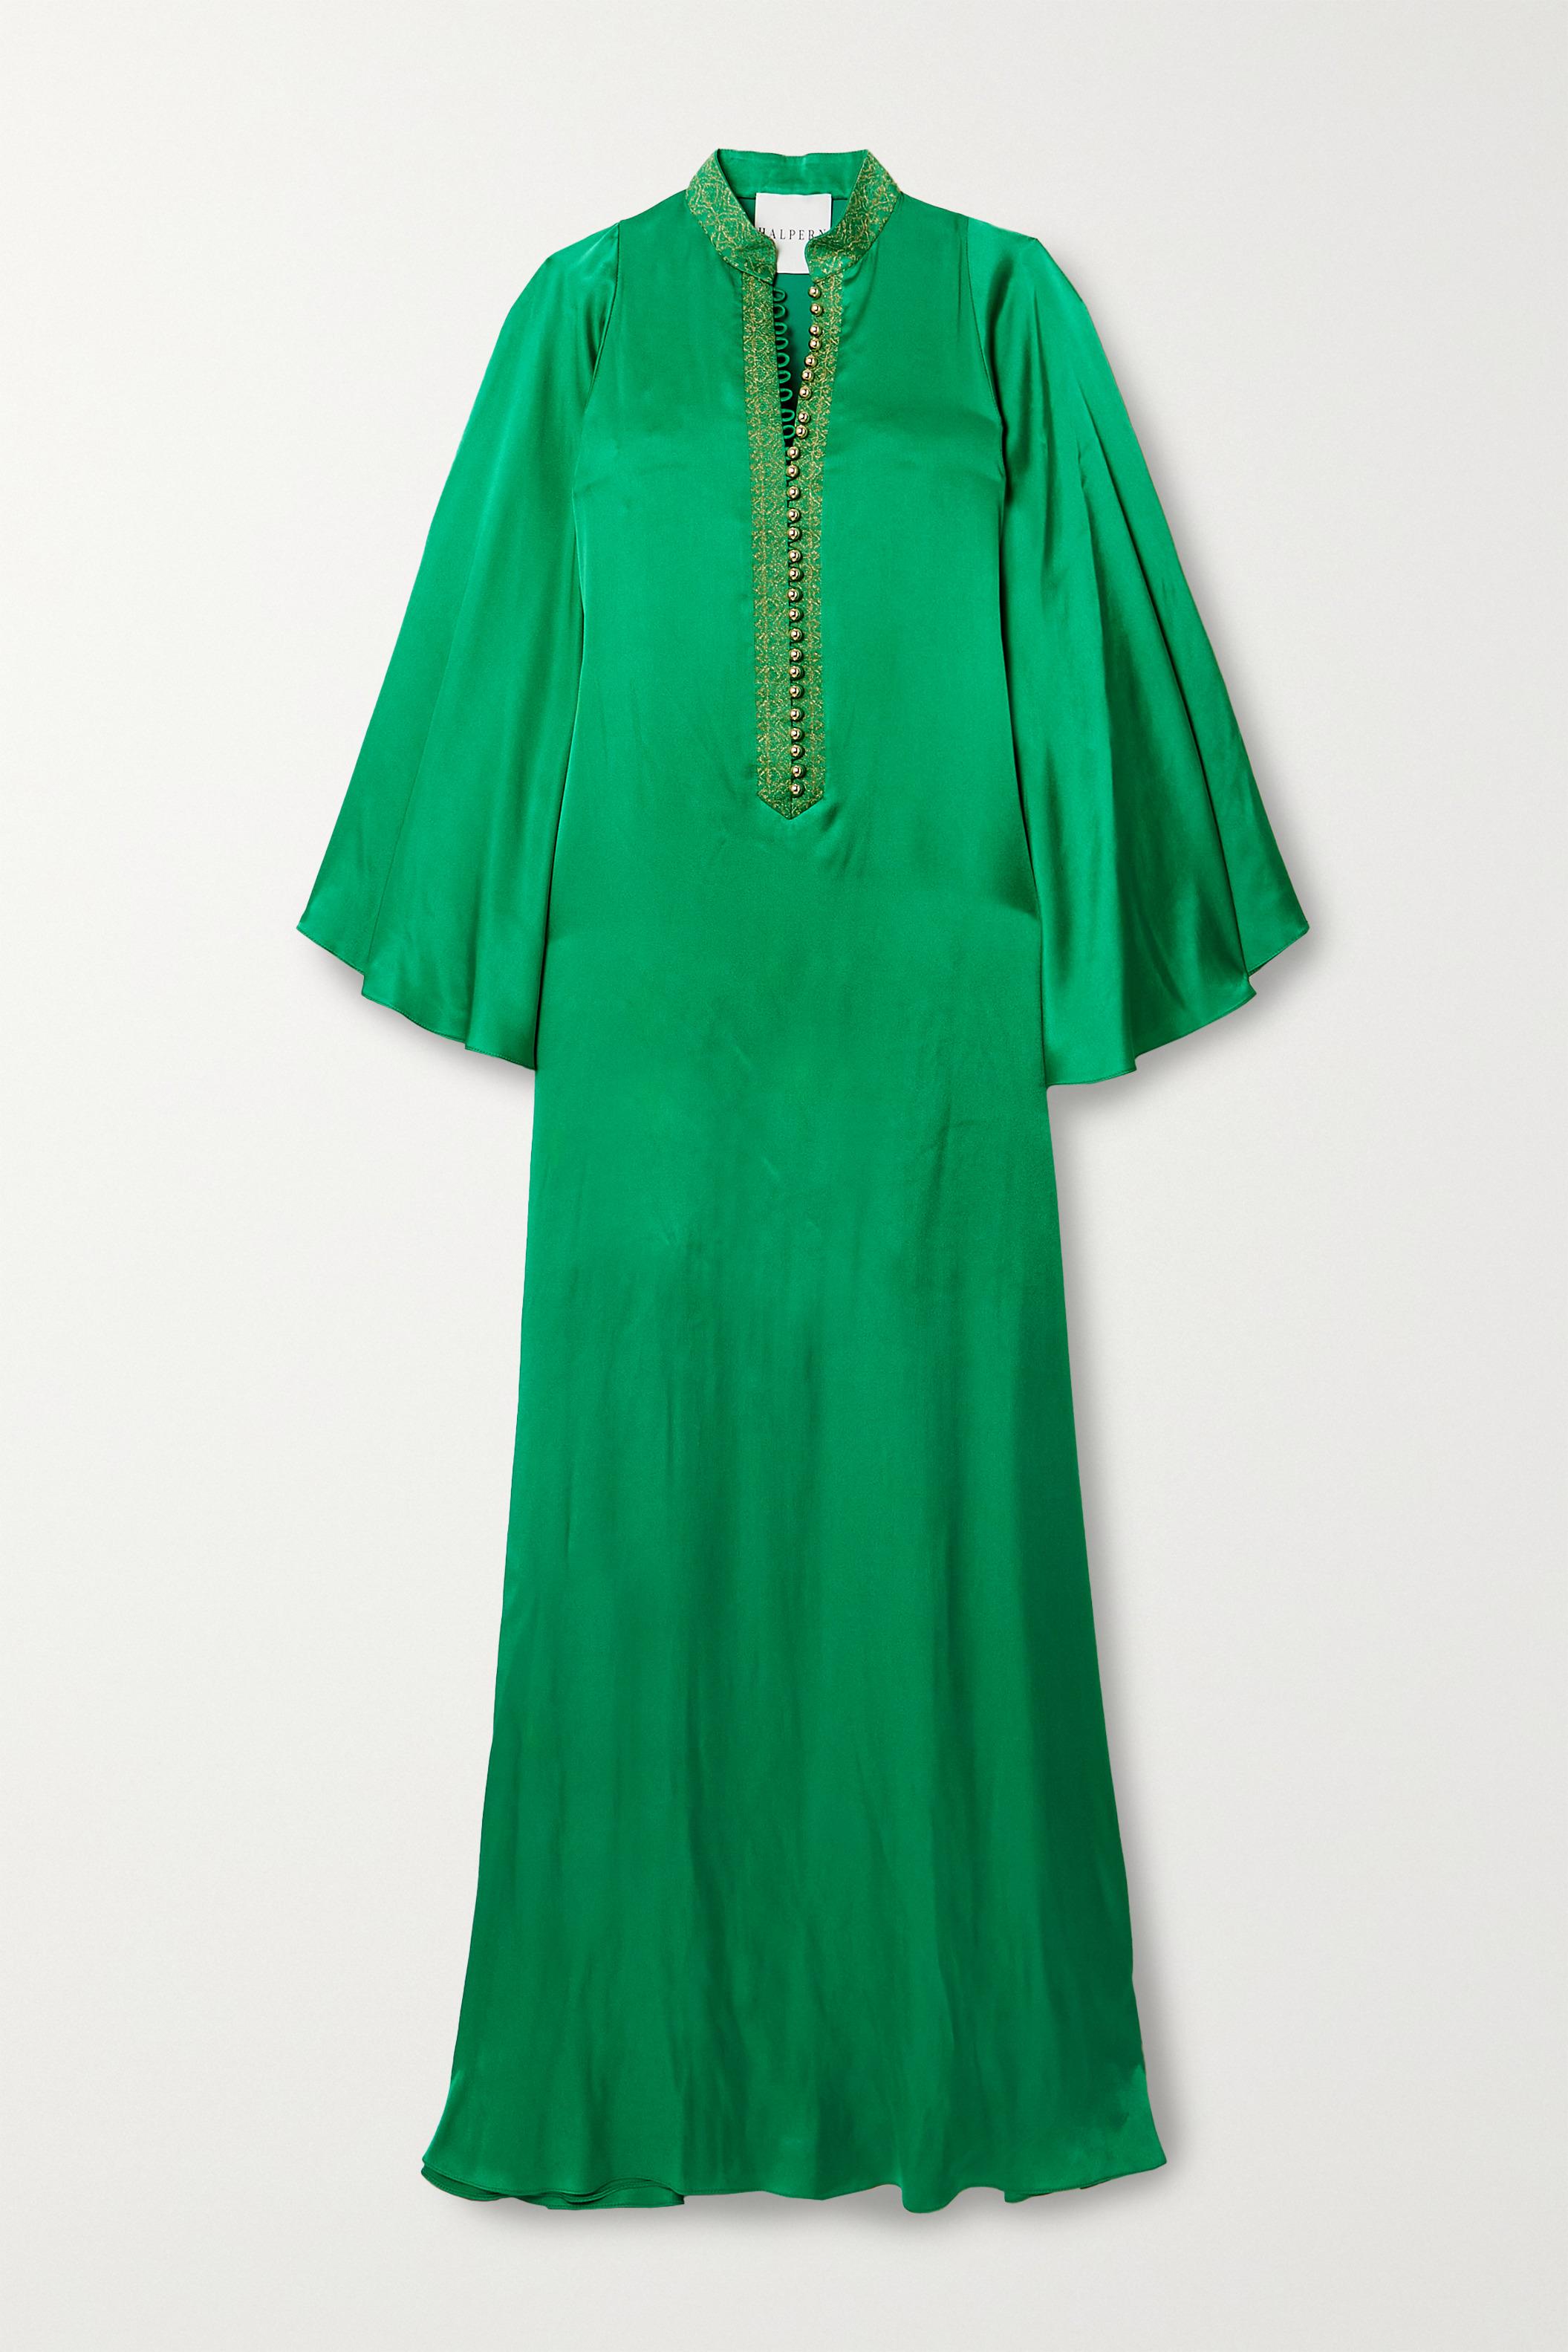 Net-a-Porter celebrates modest fashion ahead of Ramadan (фото 3)